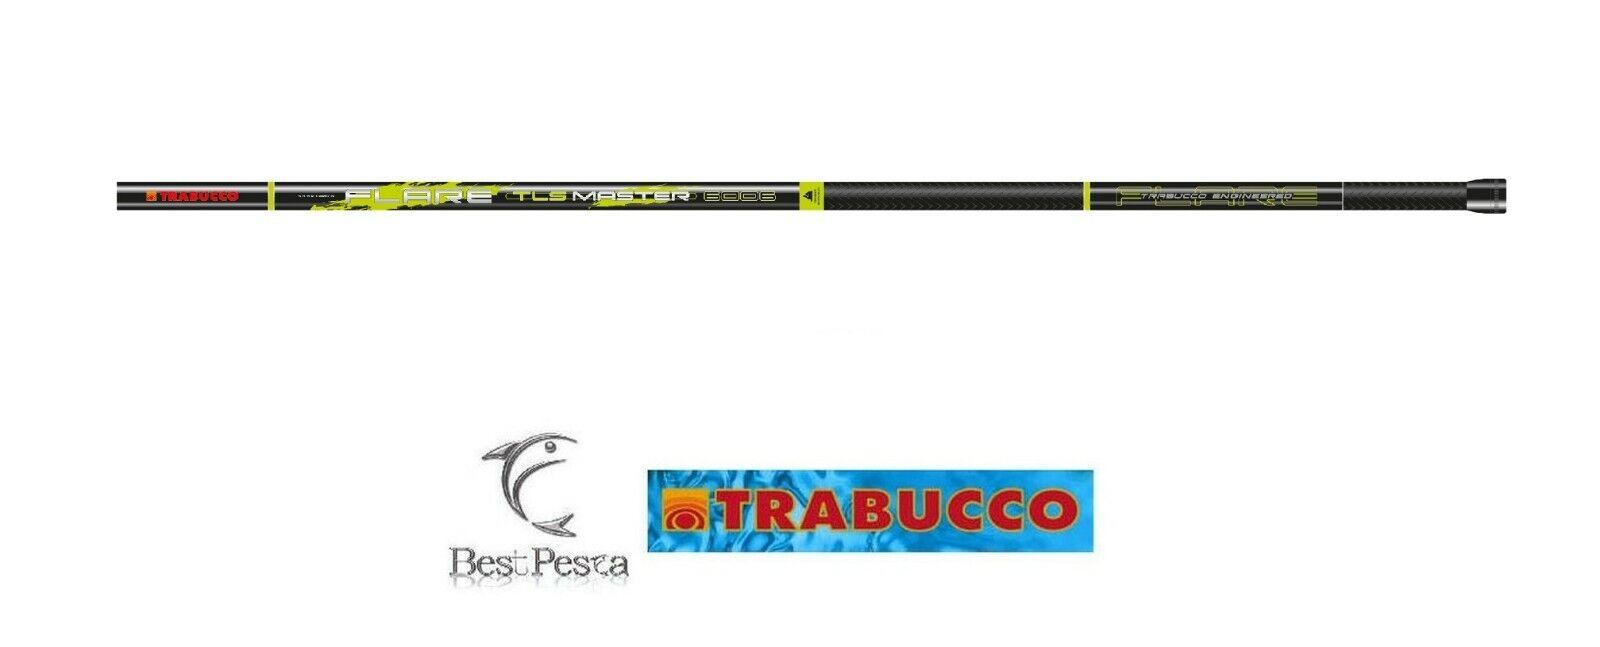 Fast Barrel -trabucco Flare TLS Master 7mt -COD  134 -41 -700